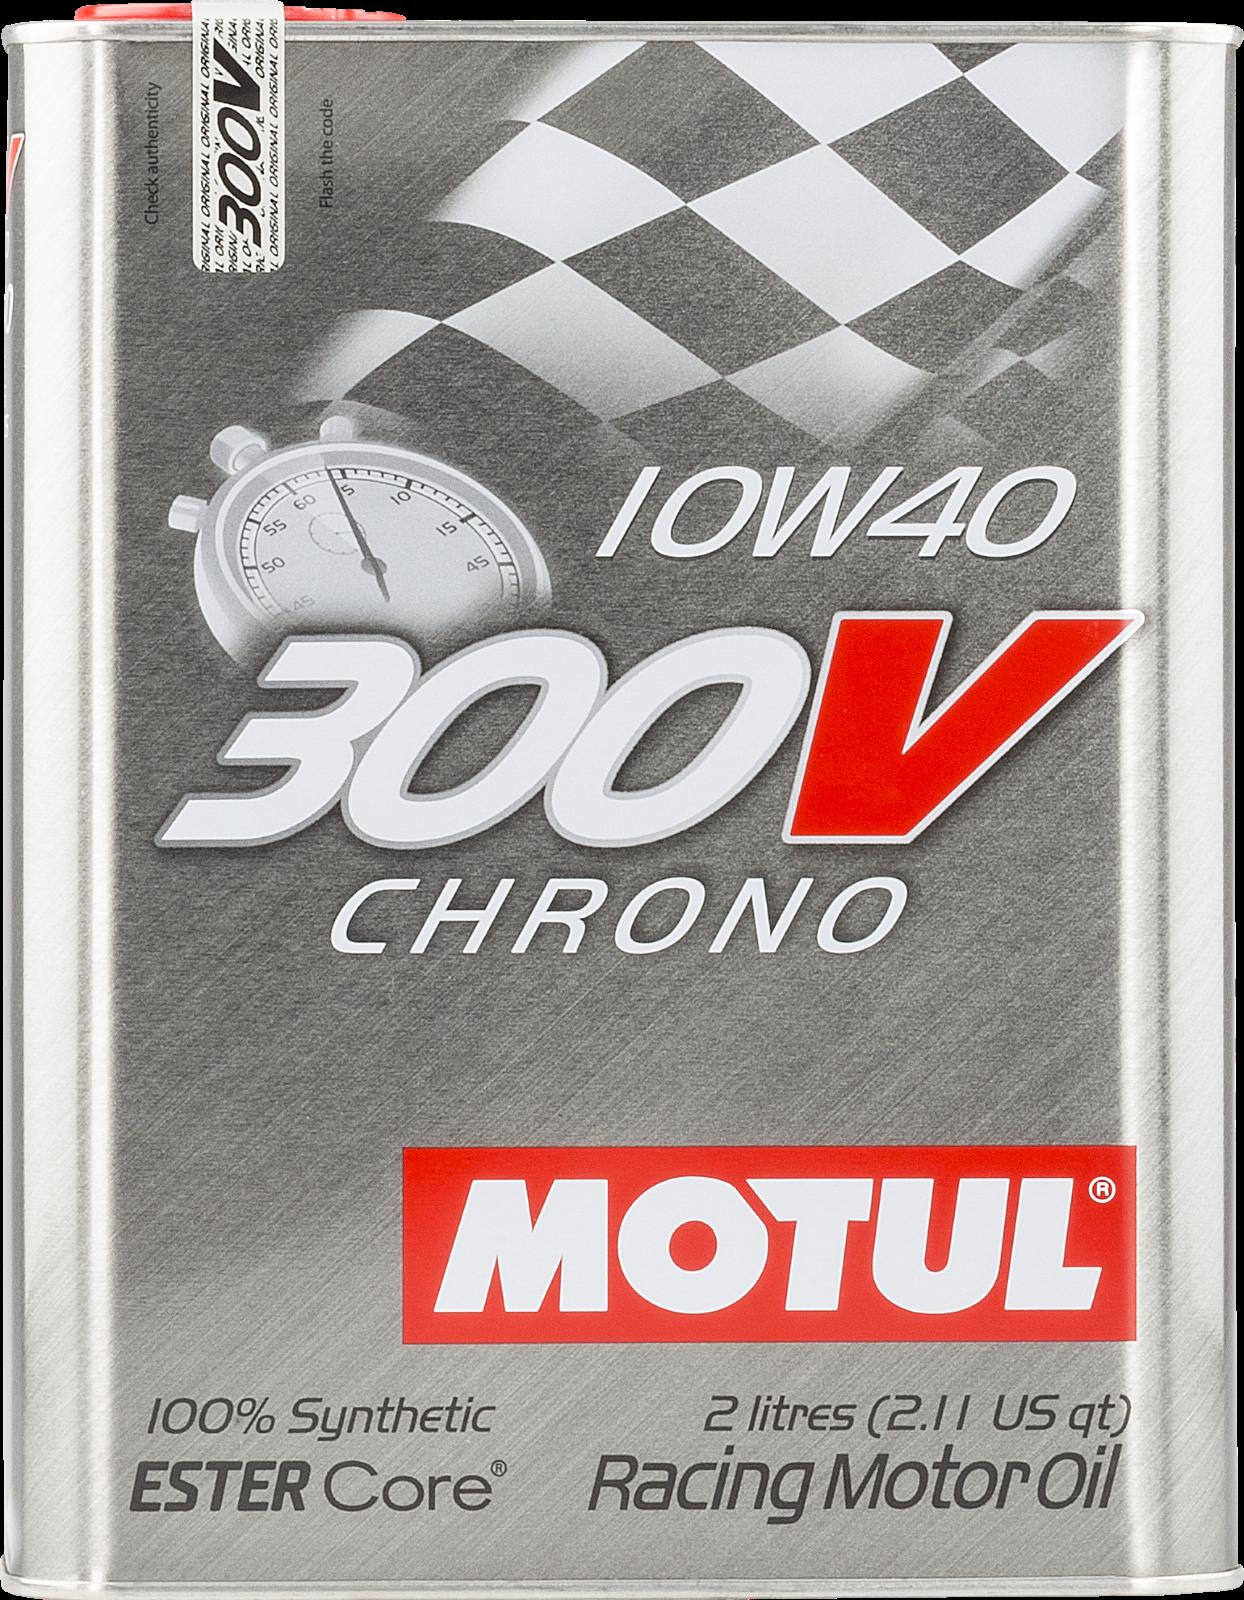 MOTUL AG MOTUL 300V Chrono 10W-40 2L